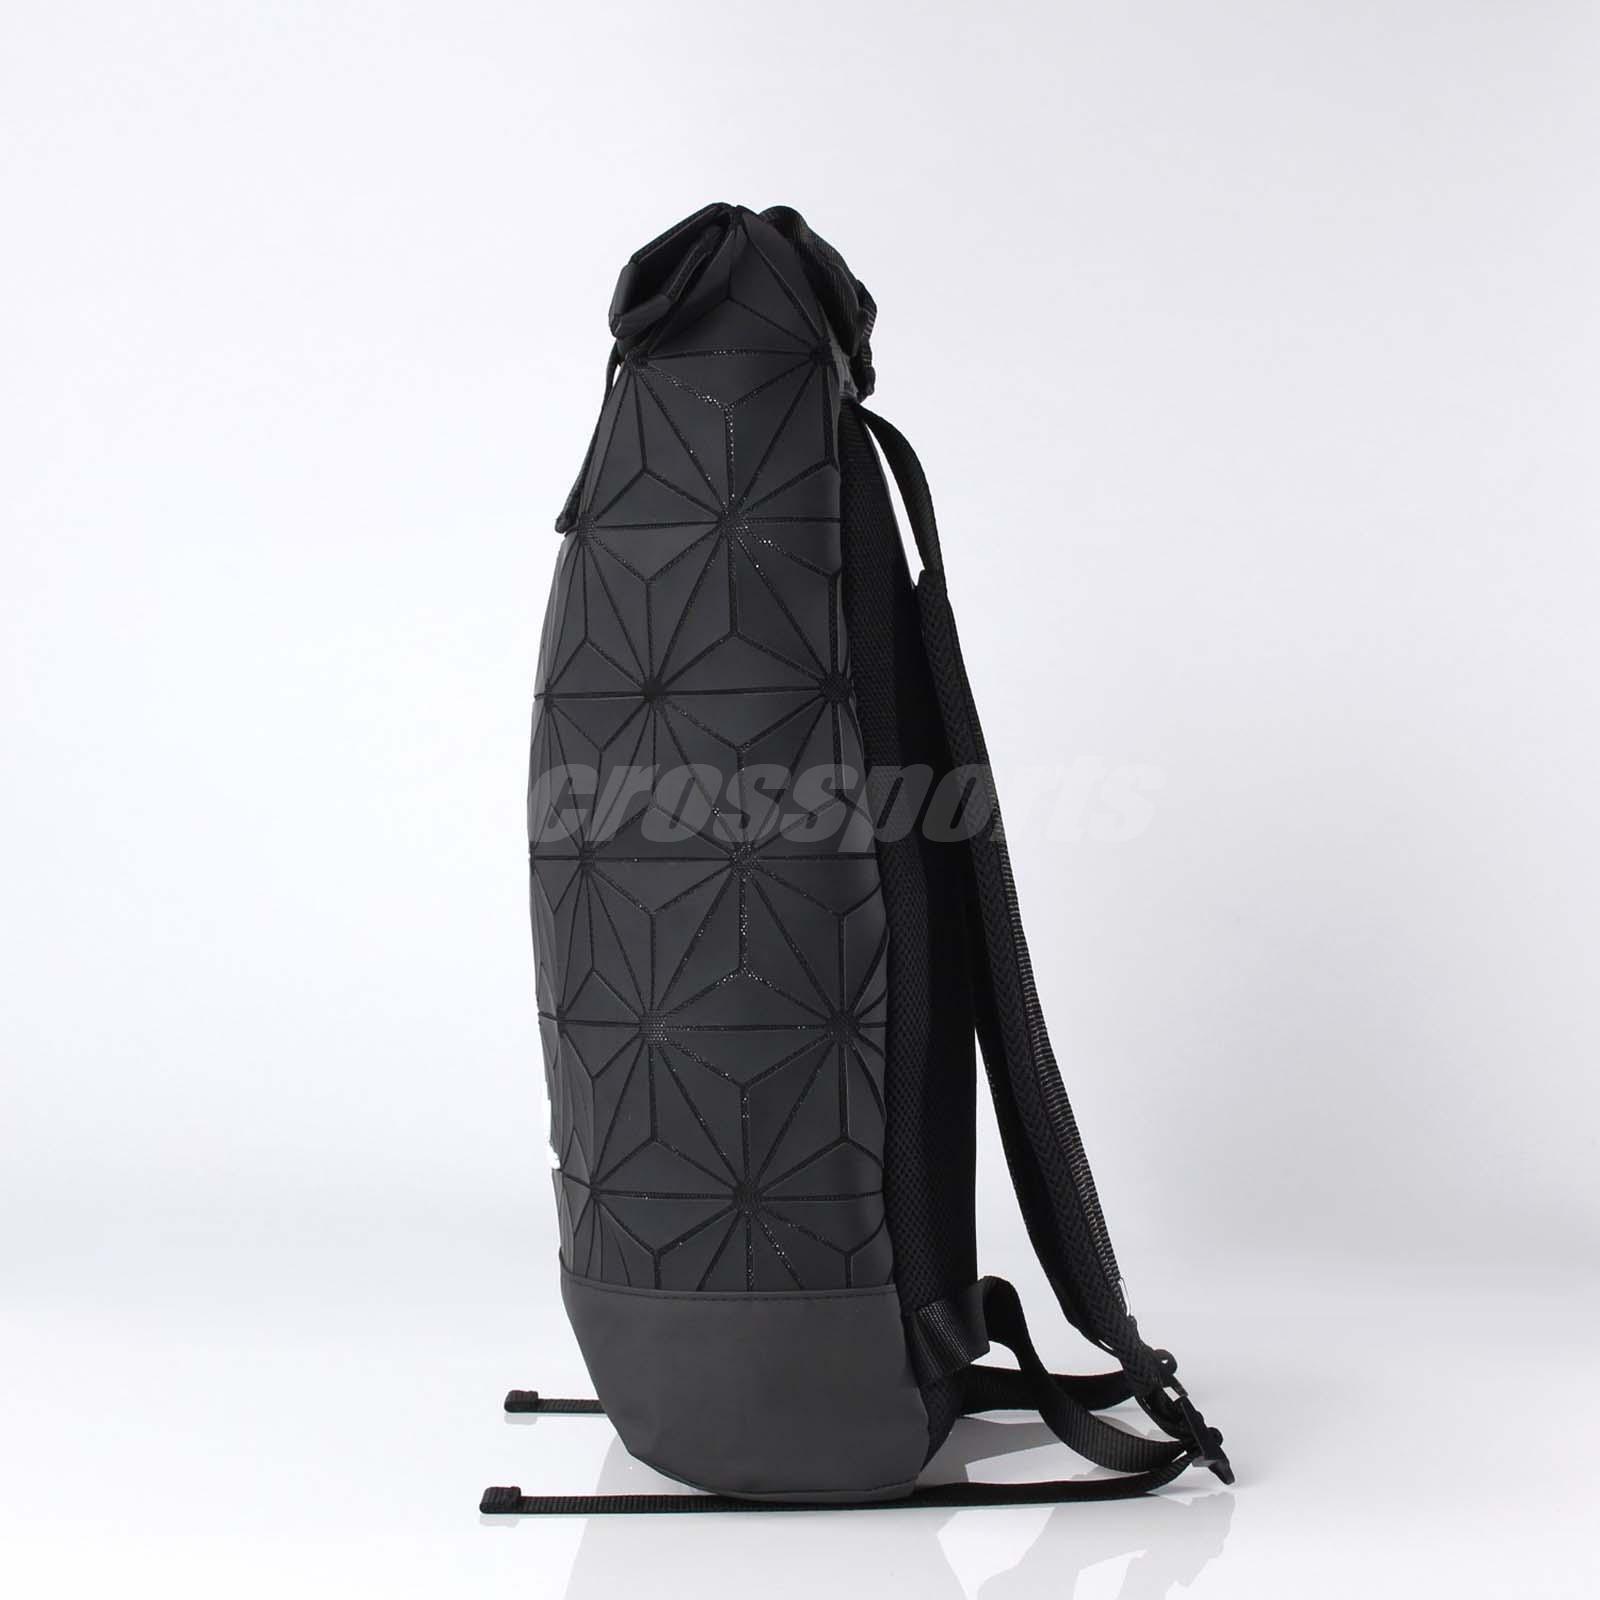 Source · adidas Originals BP Roll Top 3D Mesh 2017 Black White Backpack Bag e4cca72e1f